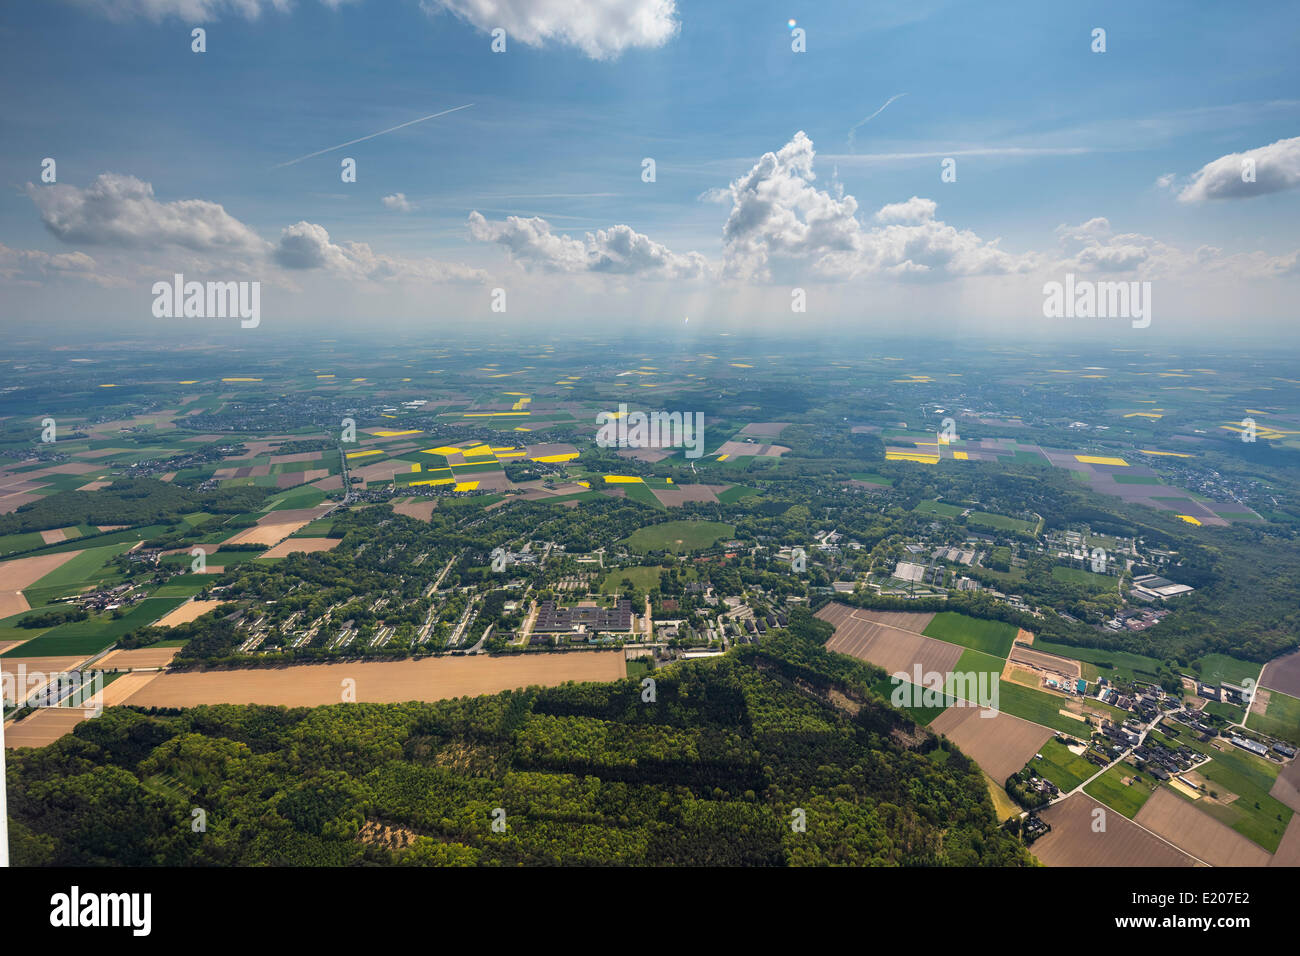 Aerial view, former military base of the British Army of the Rhine, JHQ Rheindahlen, Mönchengladbach, North - Stock Image